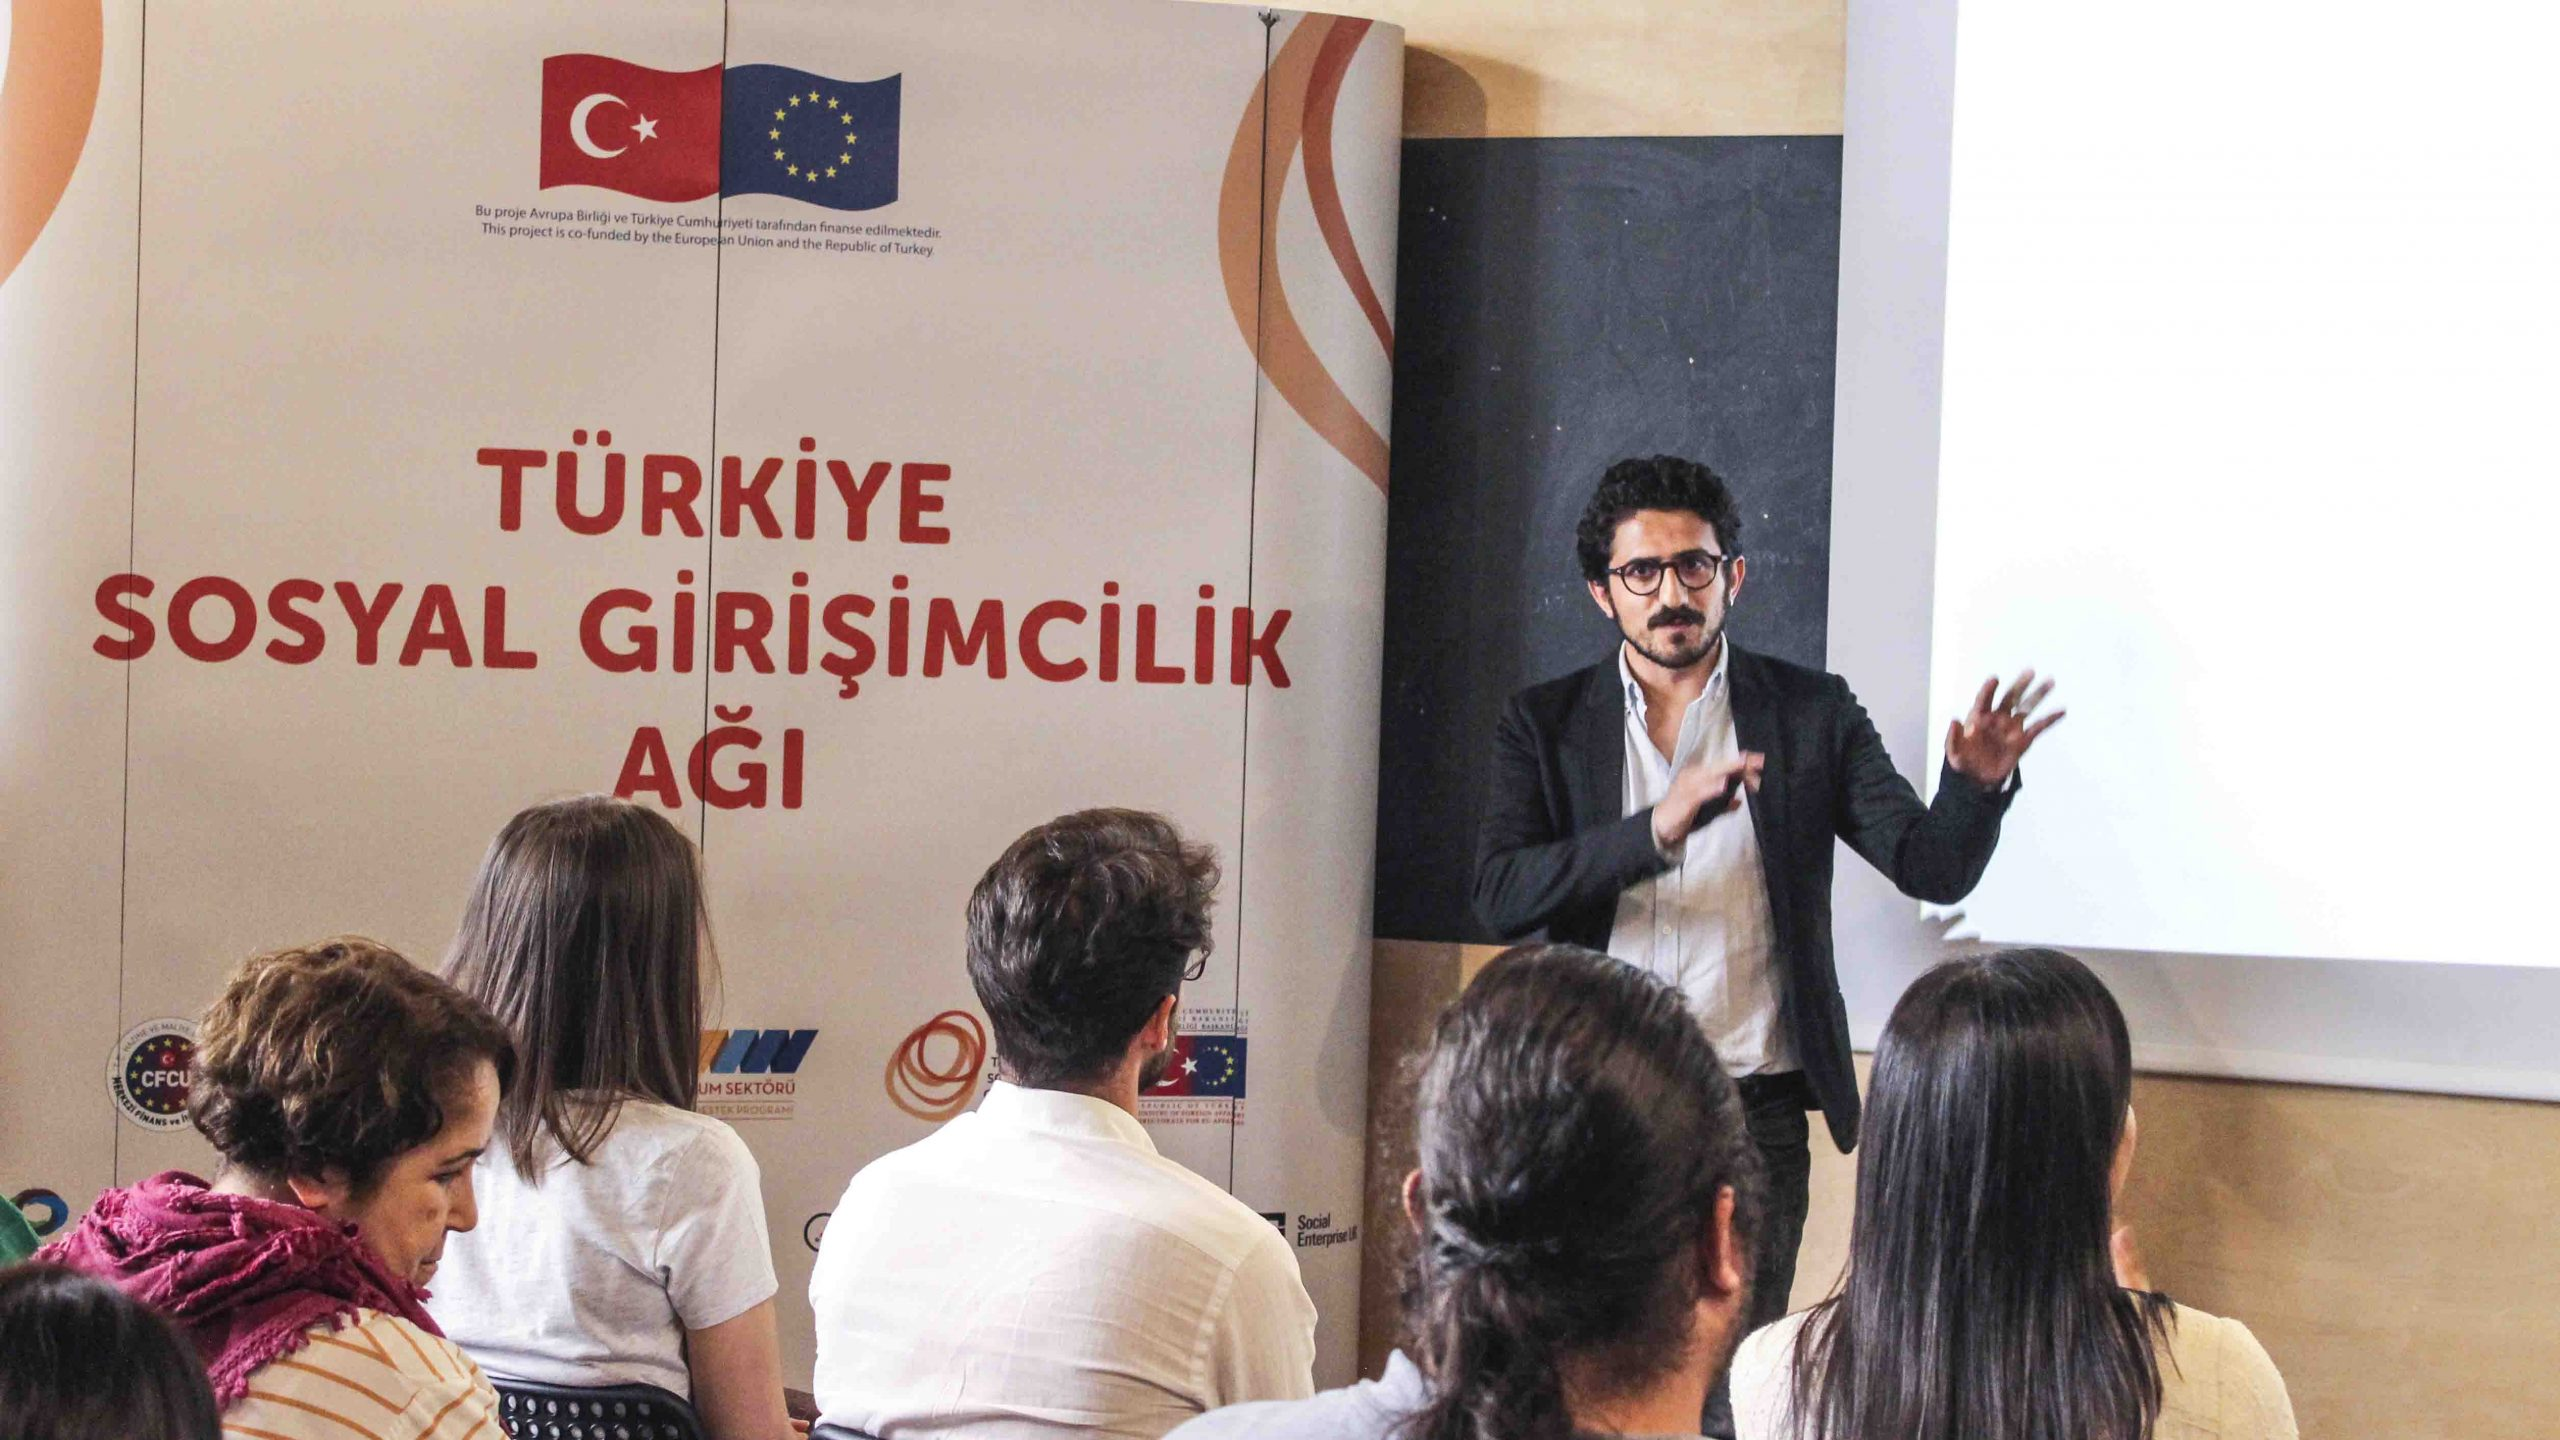 Turkey social entrepreneurial network TGSA emrah kurum